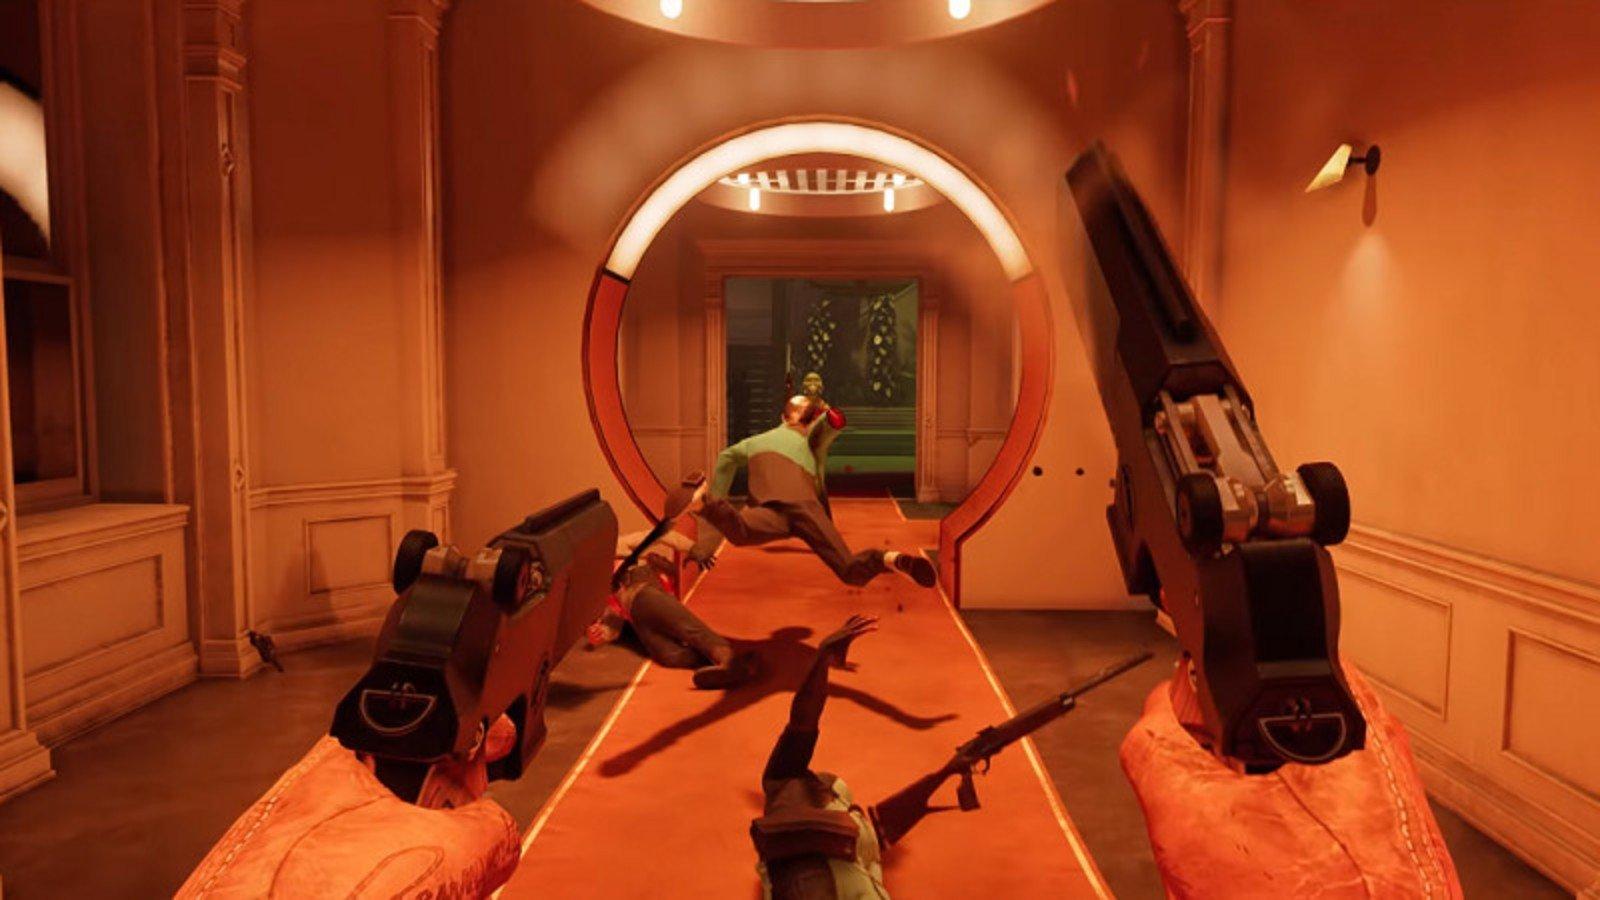 deathloop action video game hd wallpaper 2401